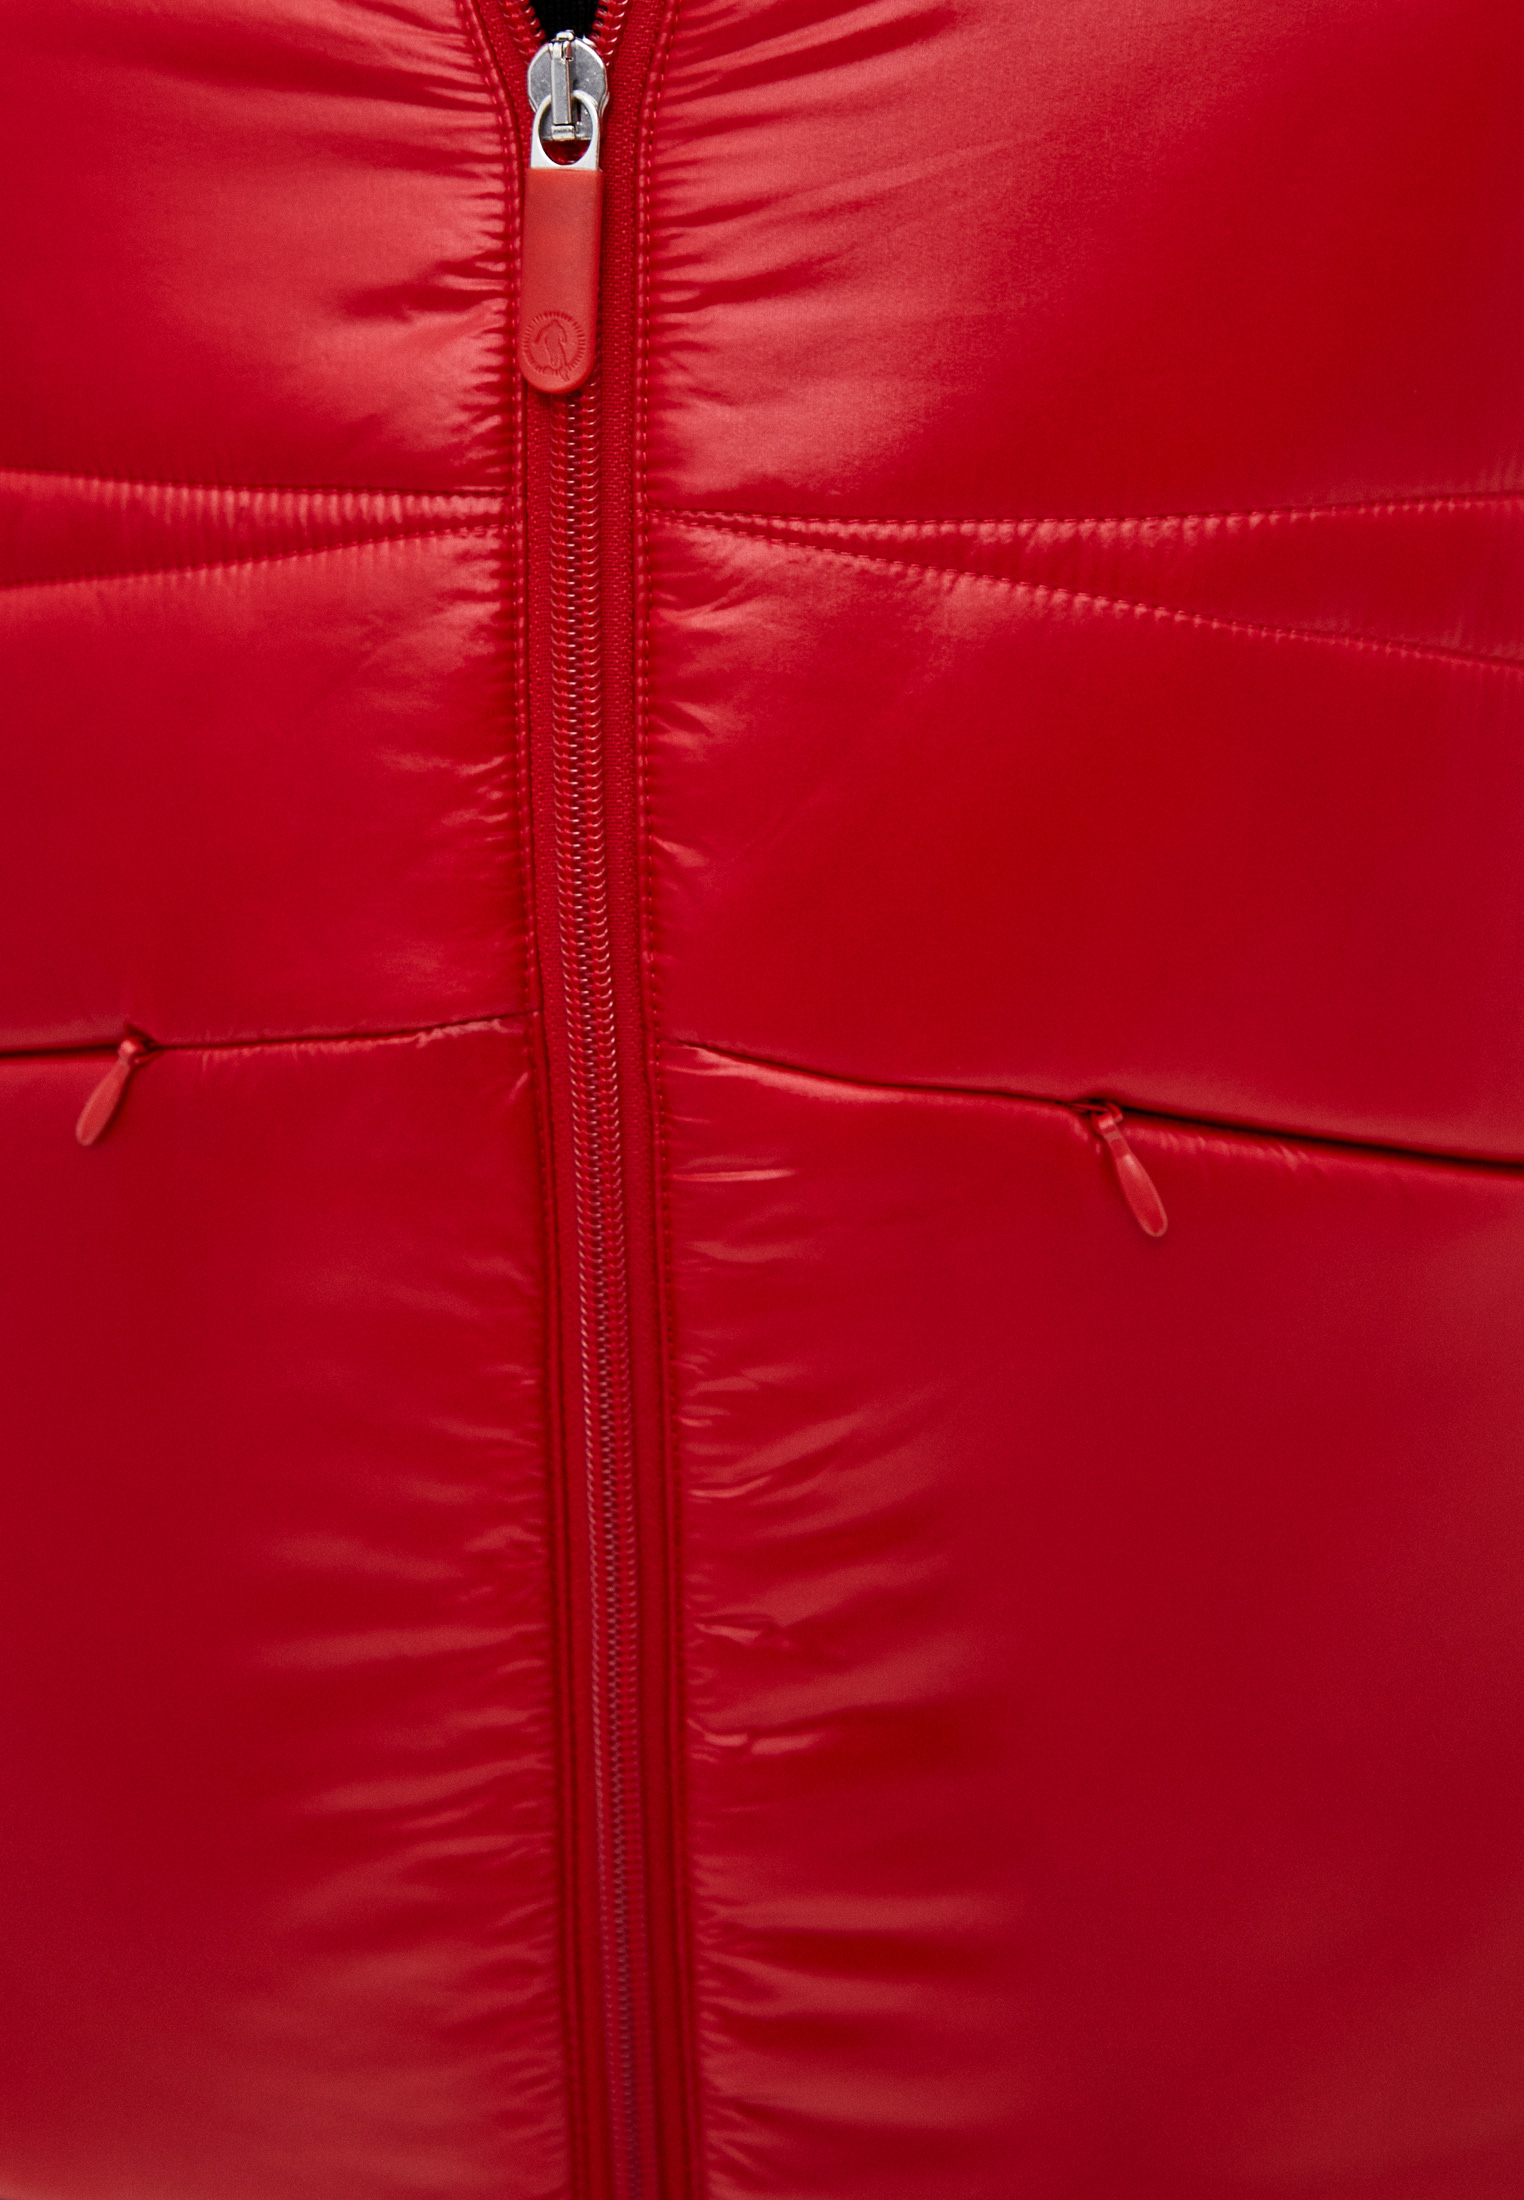 Мужская куртка Bikkembergs (Биккембергс) C H 082 01 T 9846: изображение 12